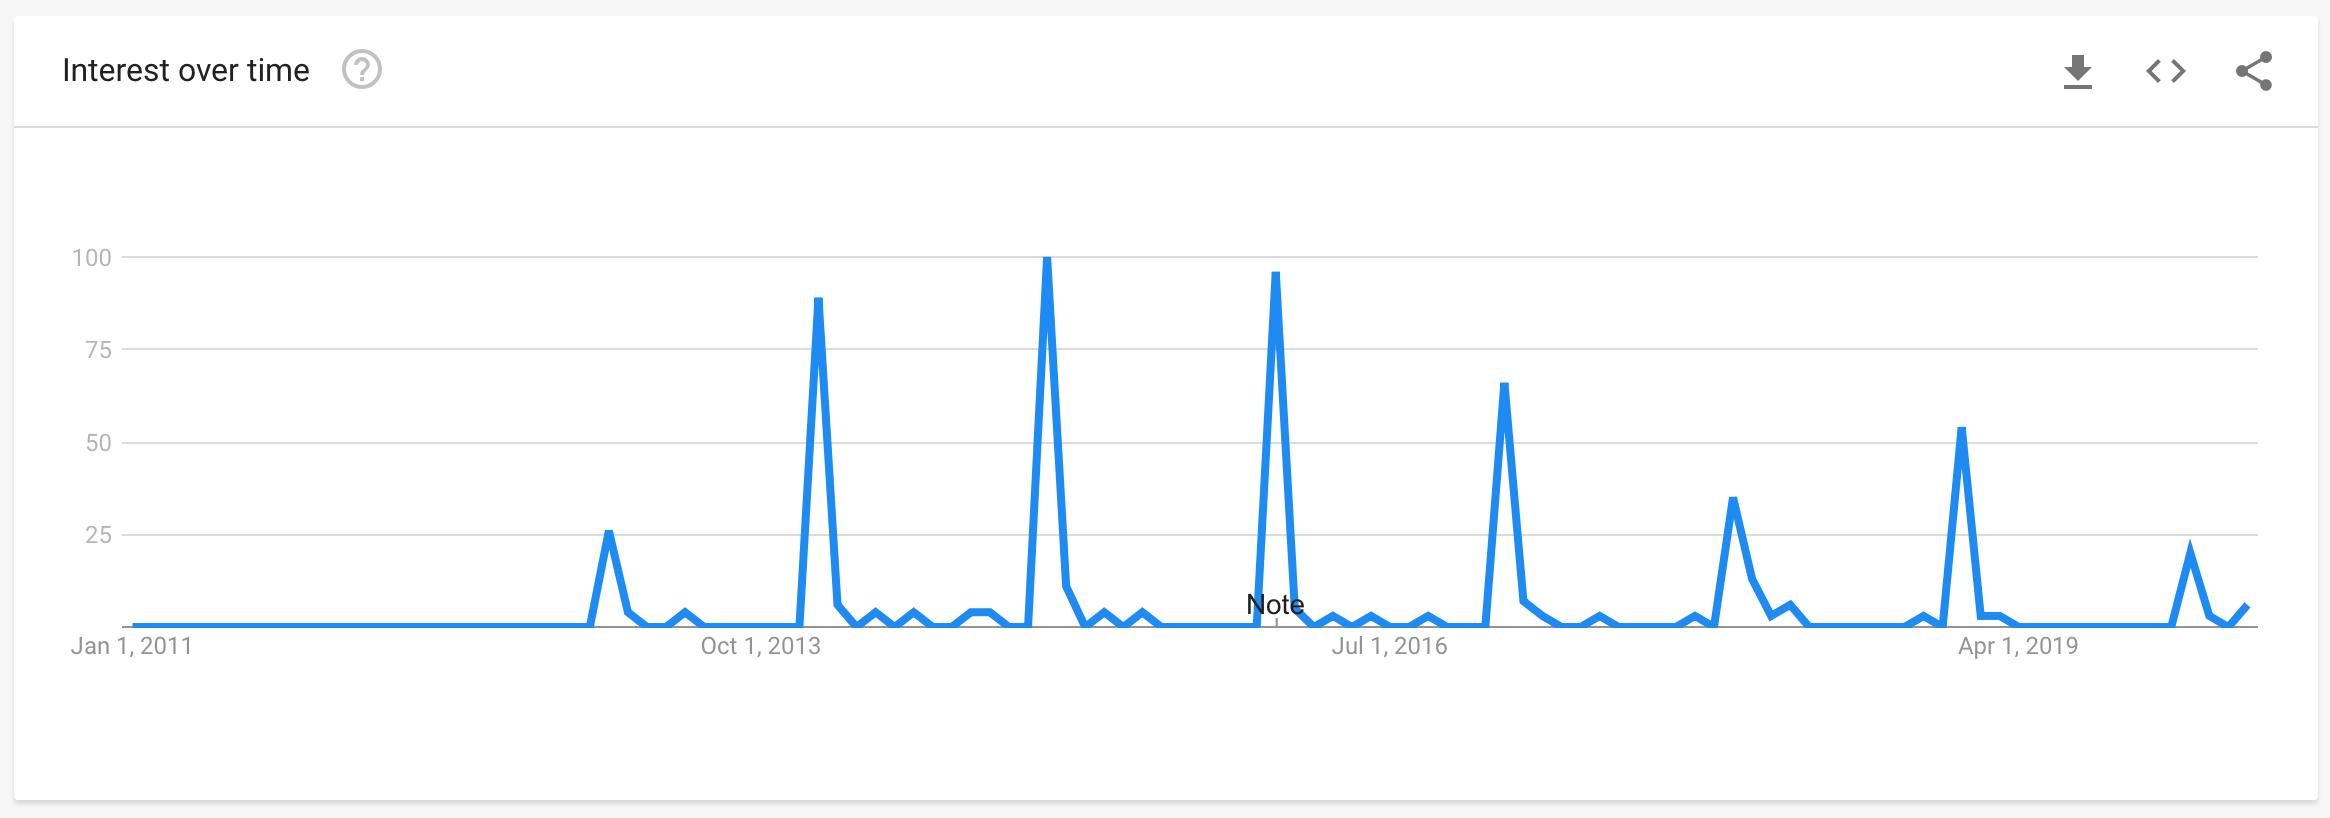 #BellLetsTalk Google Trends